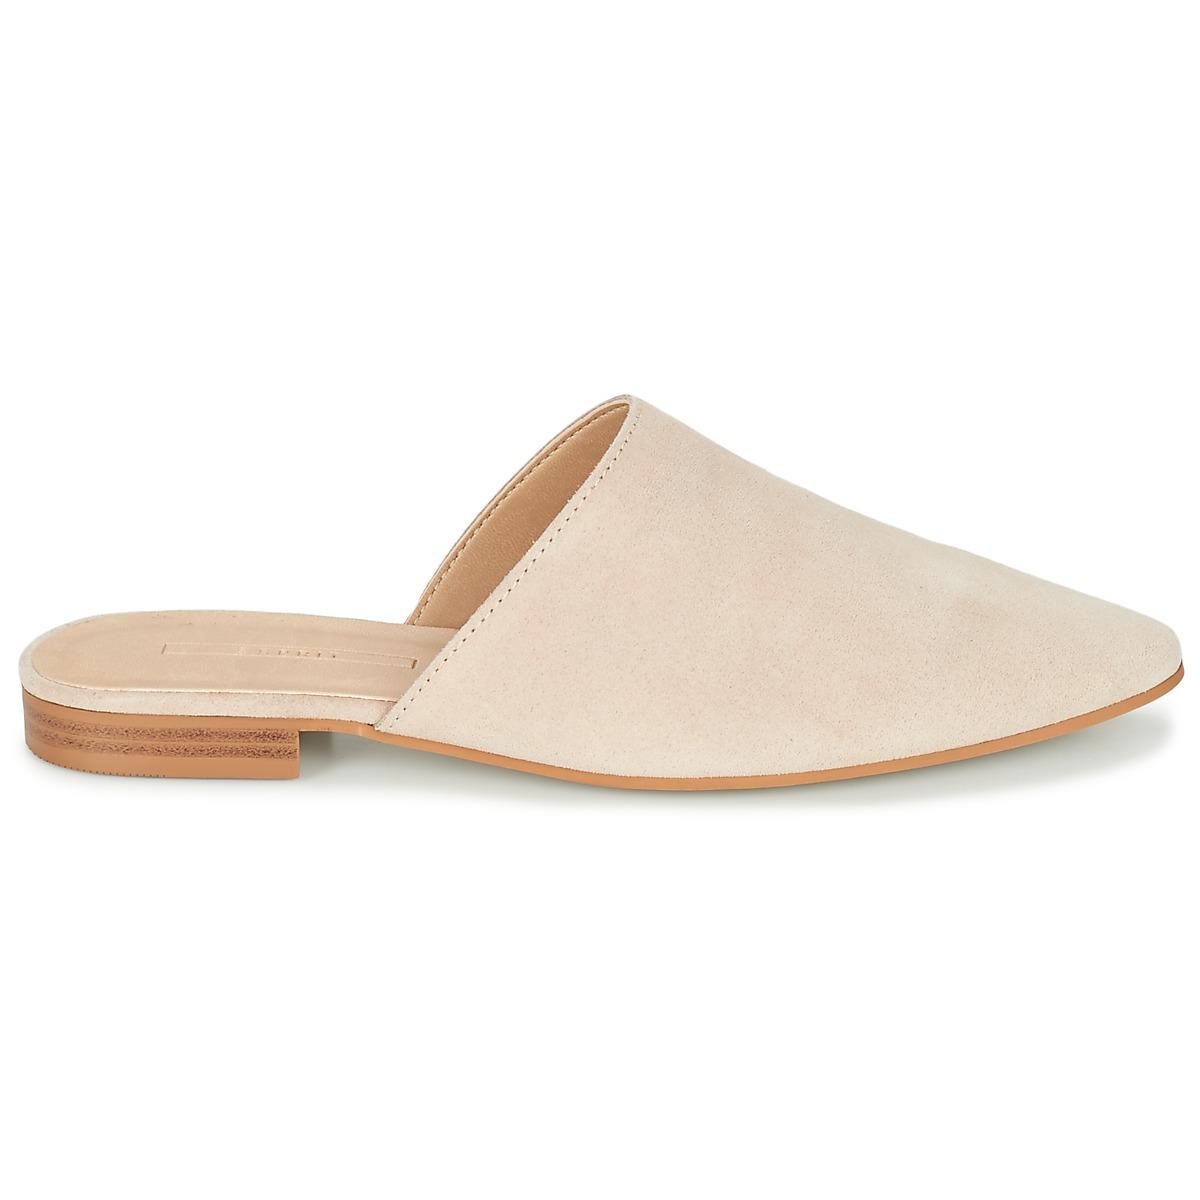 ebd4c008392 Esprit Amaris Slide Mules   Casual Shoes in Natural - Lyst